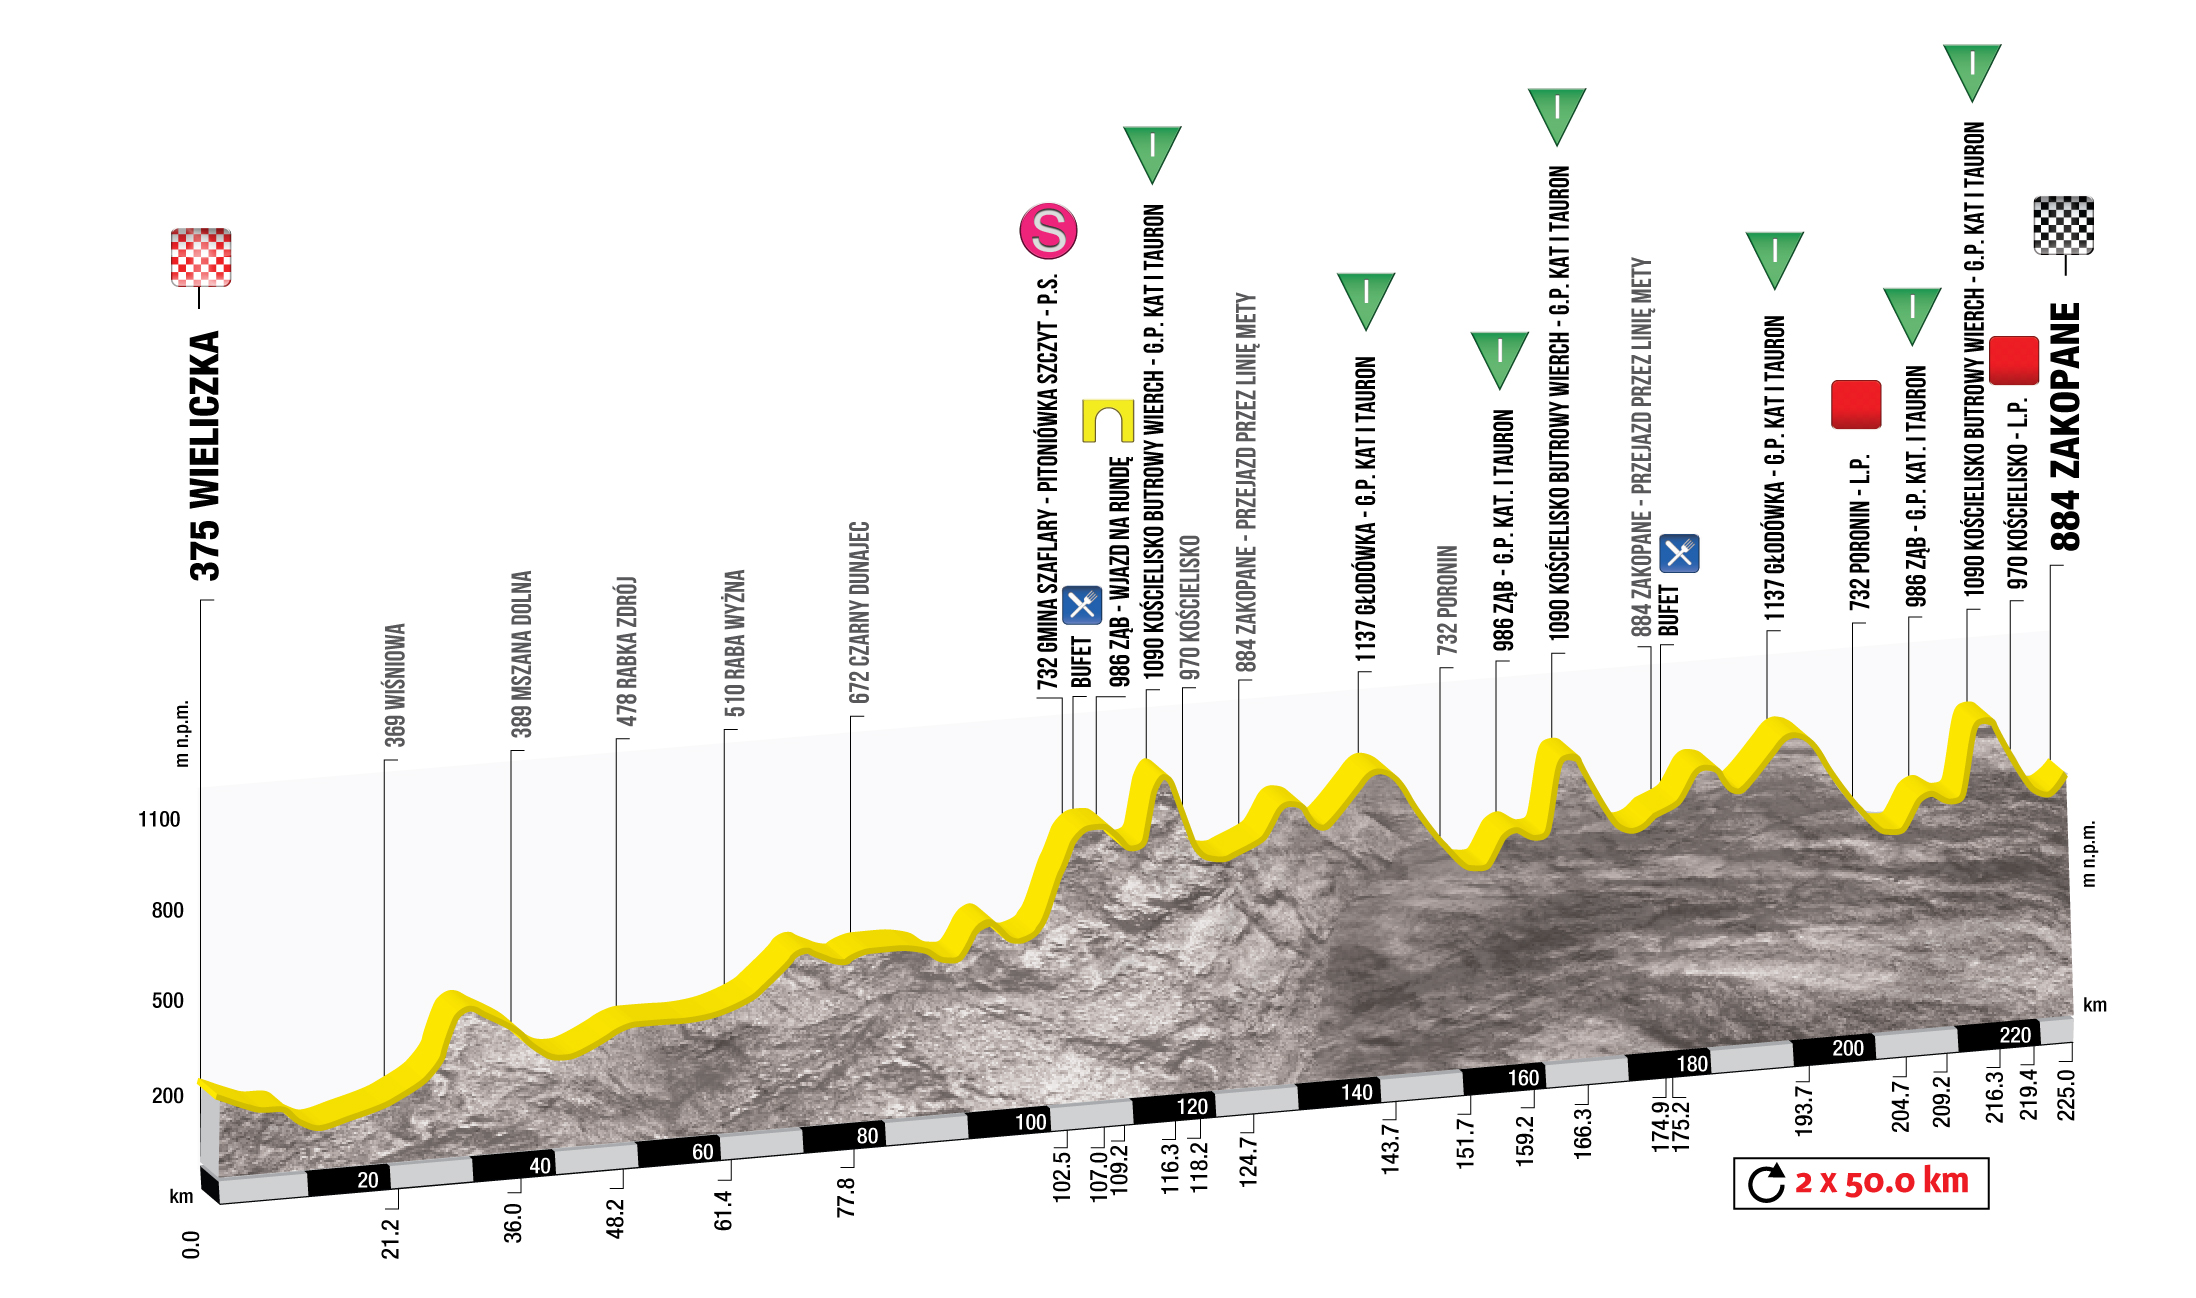 wys_etap5_TdP_UCI_WorldTour